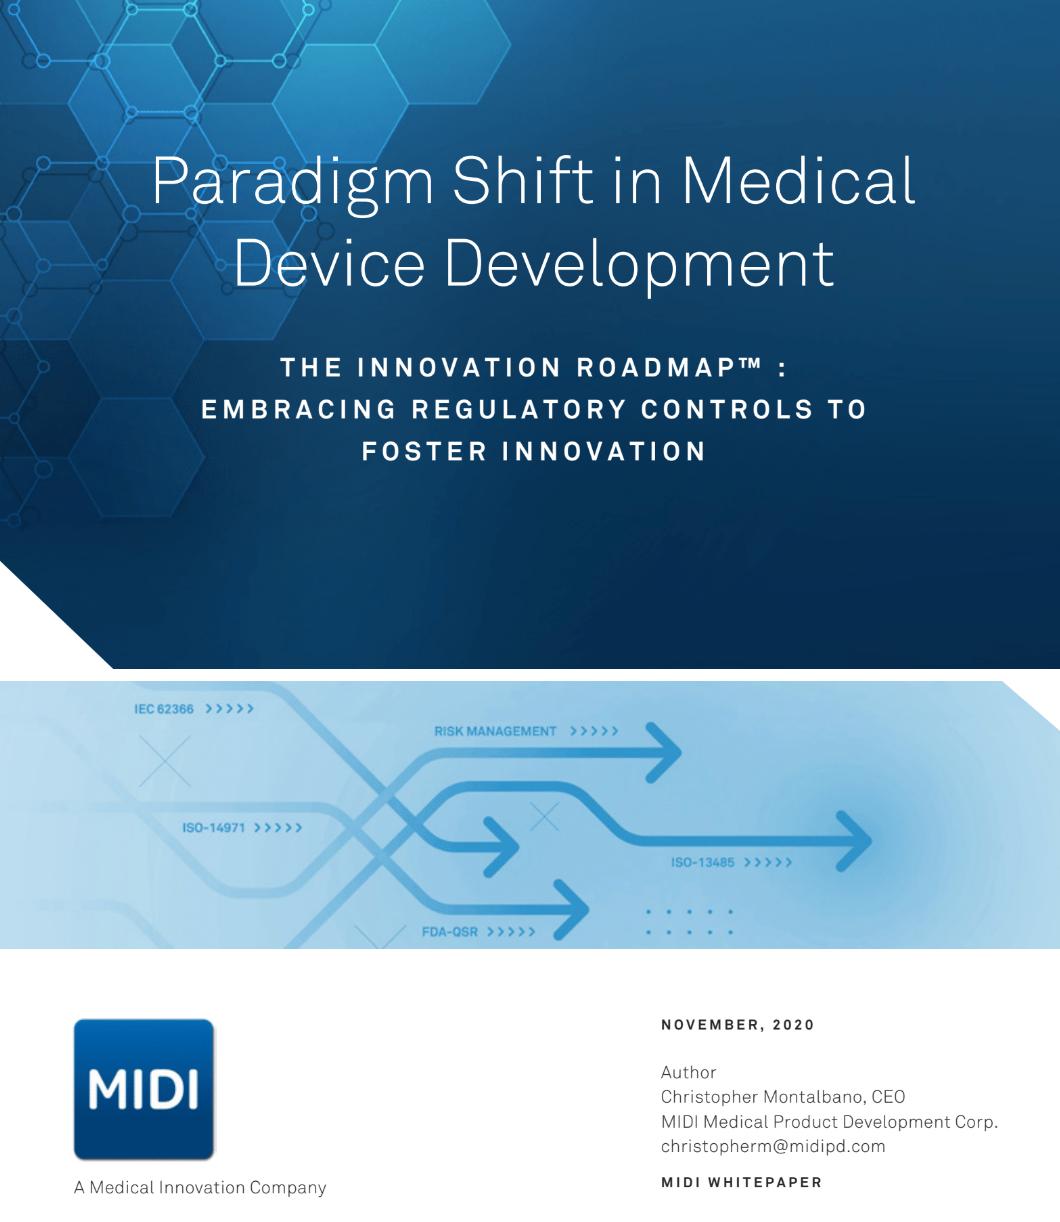 MIDI_Innovation Roadmap_WP Cover